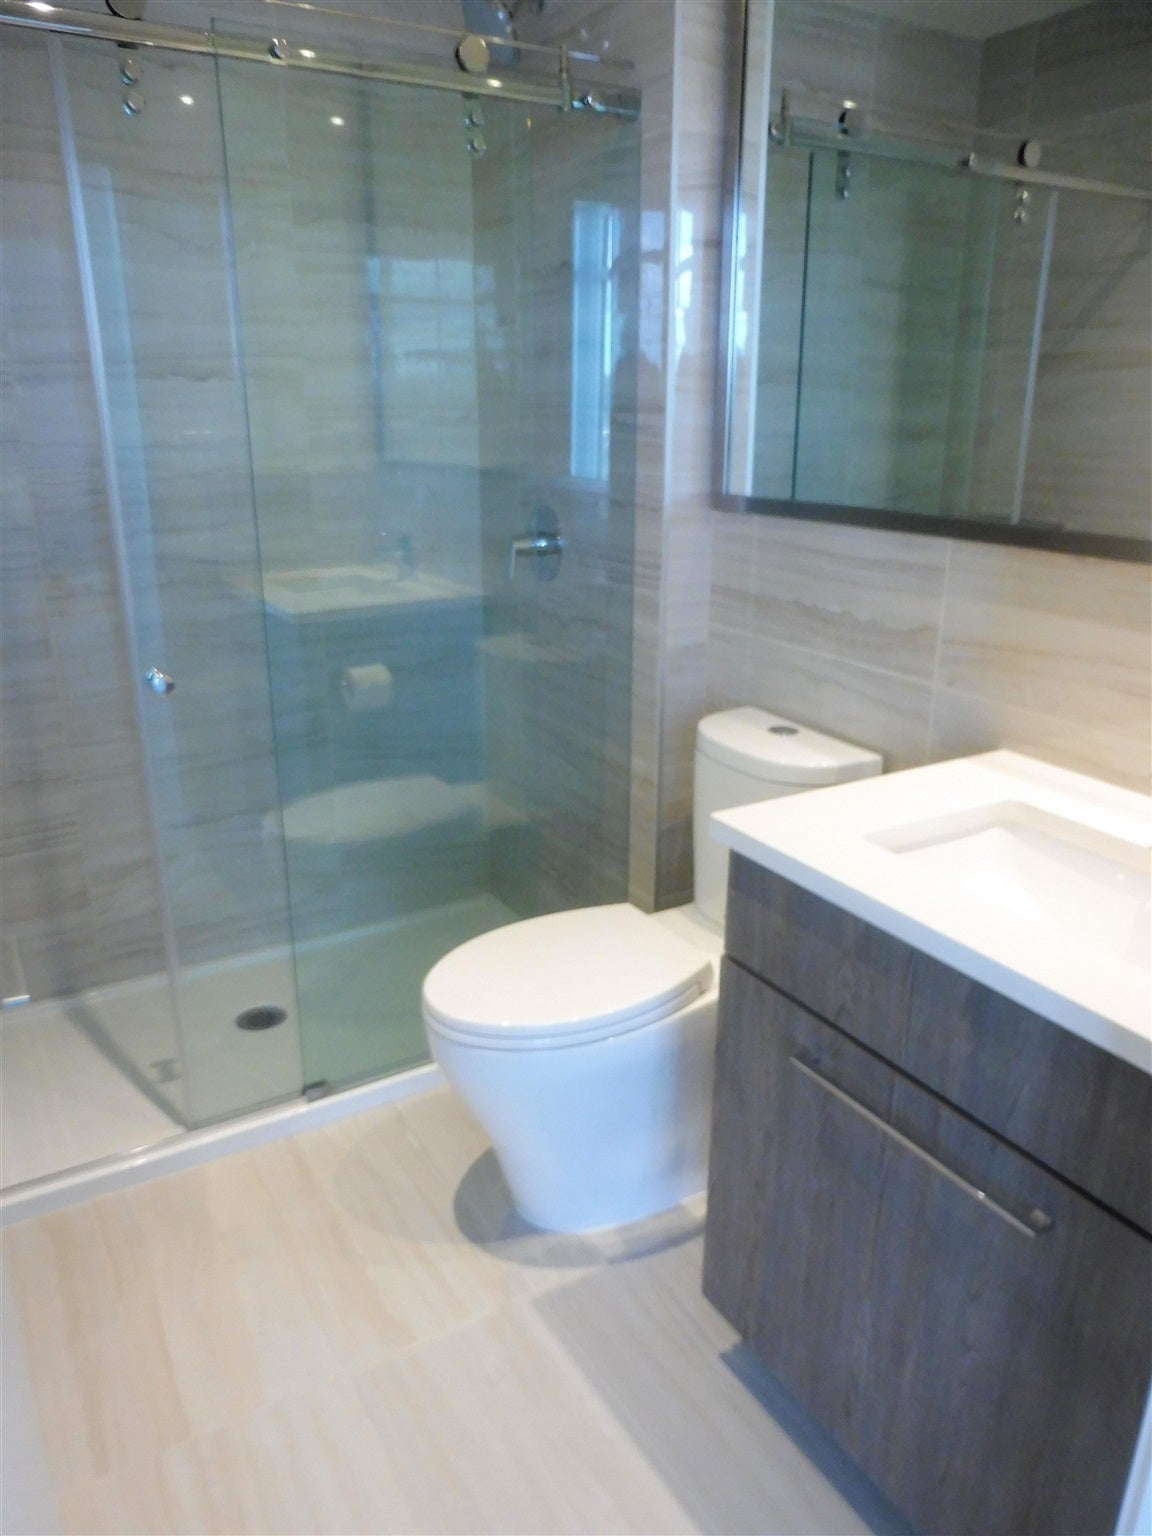 1409 691 NORTH ROAD - Coquitlam West Apartment/Condo for sale, 2 Bedrooms (R2604155) - #13